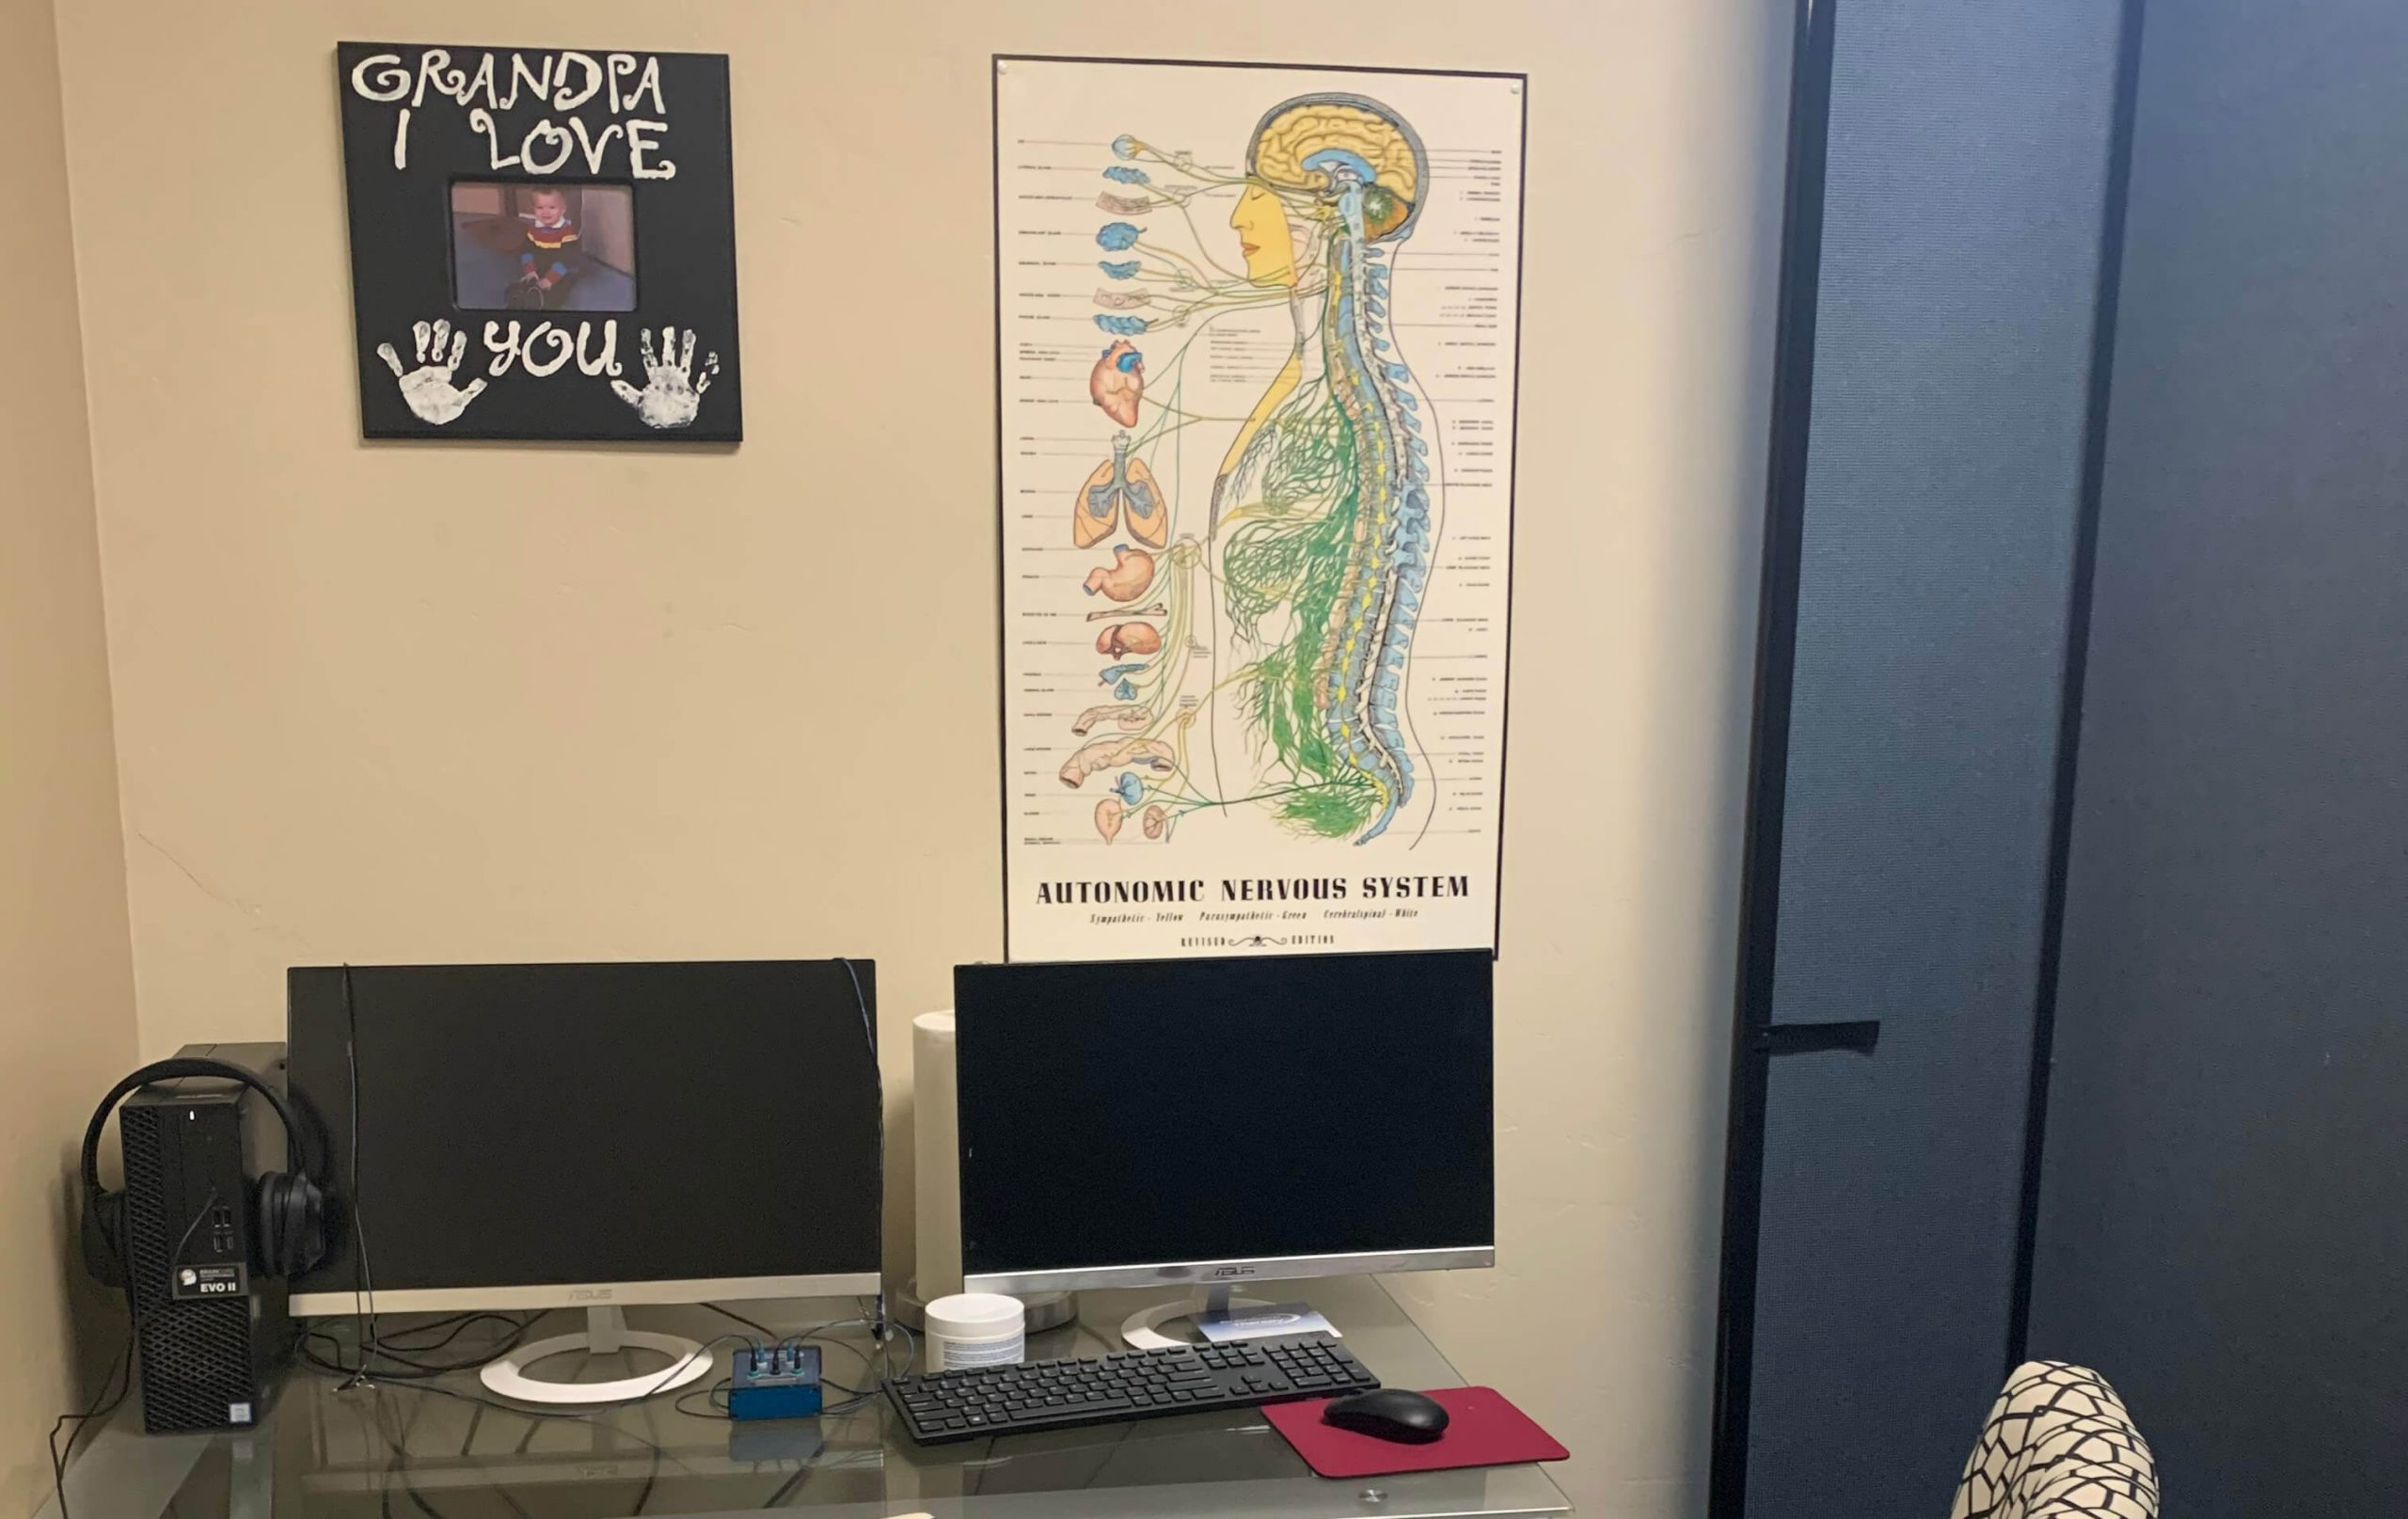 autonomic nervous system poster office setting